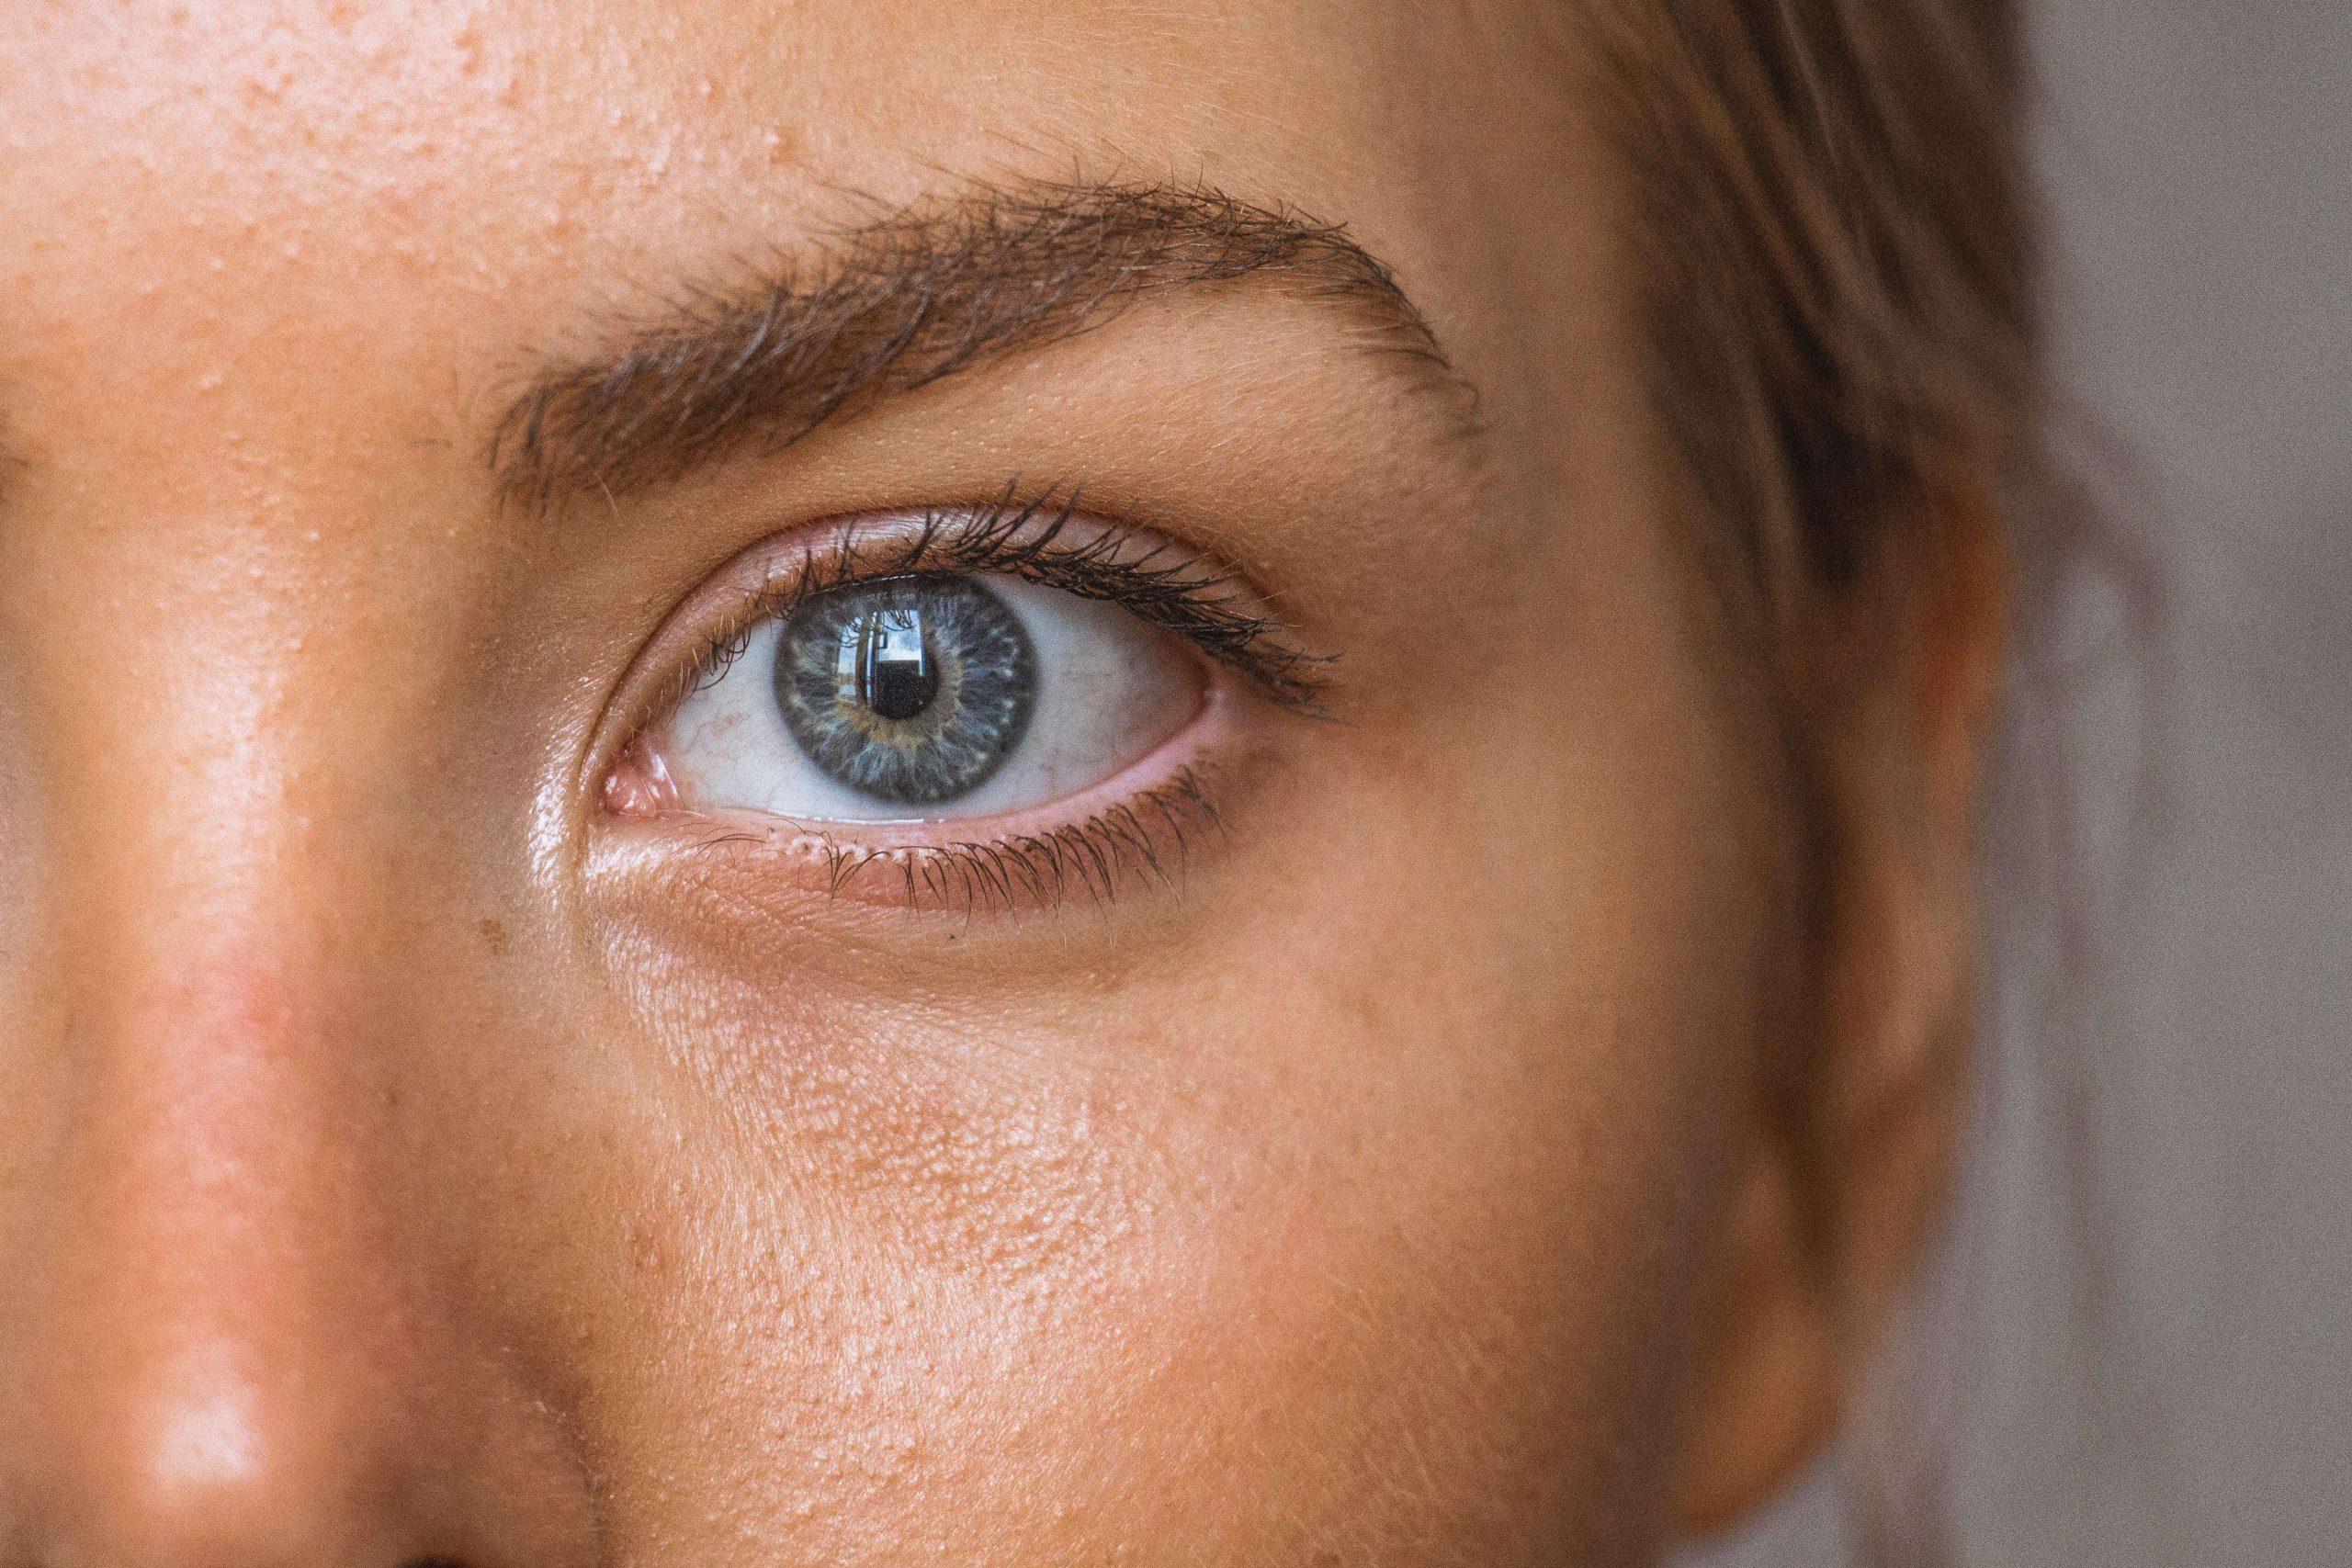 Symtom, solskadade ögon